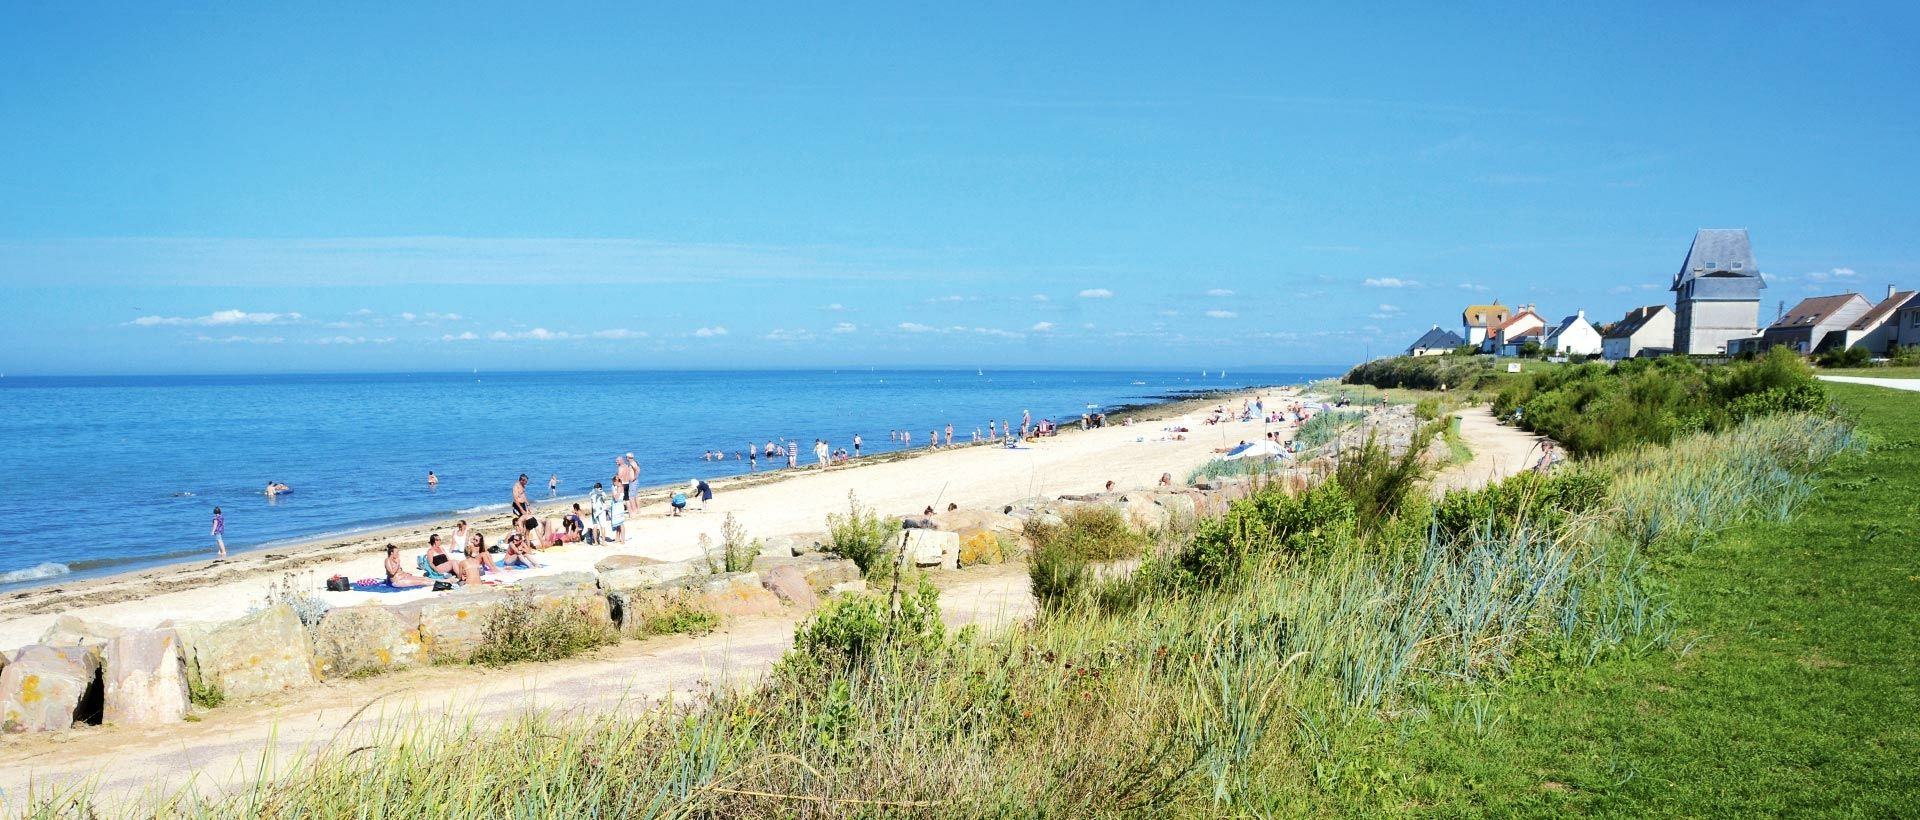 Camping Saint-Aubin-sur-Mer